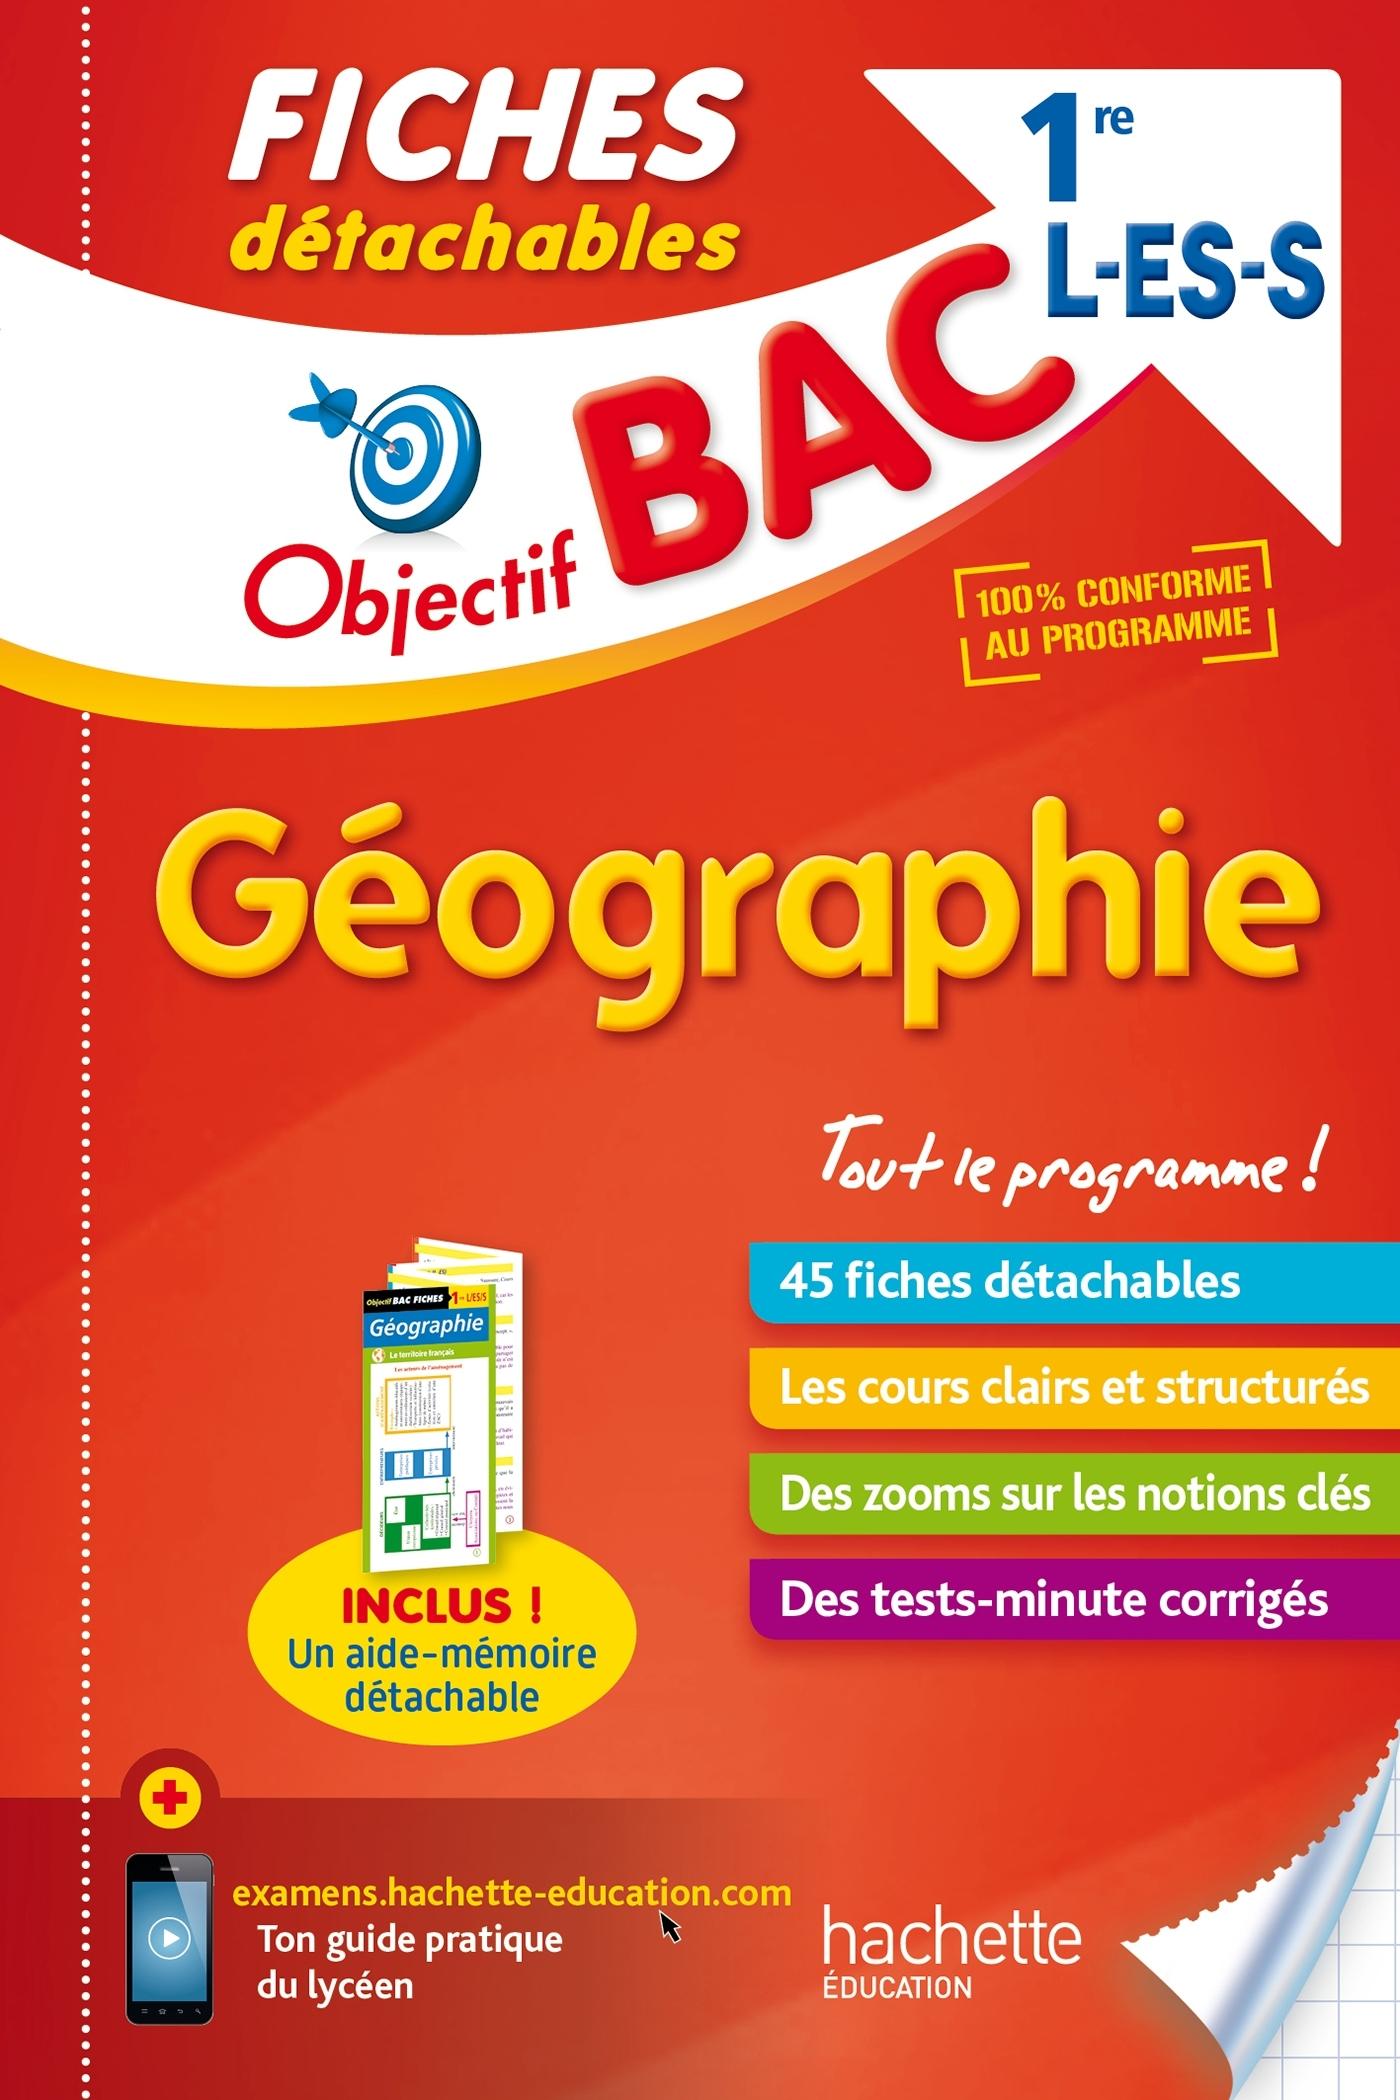 fiches detachables histoire geographie 2nde